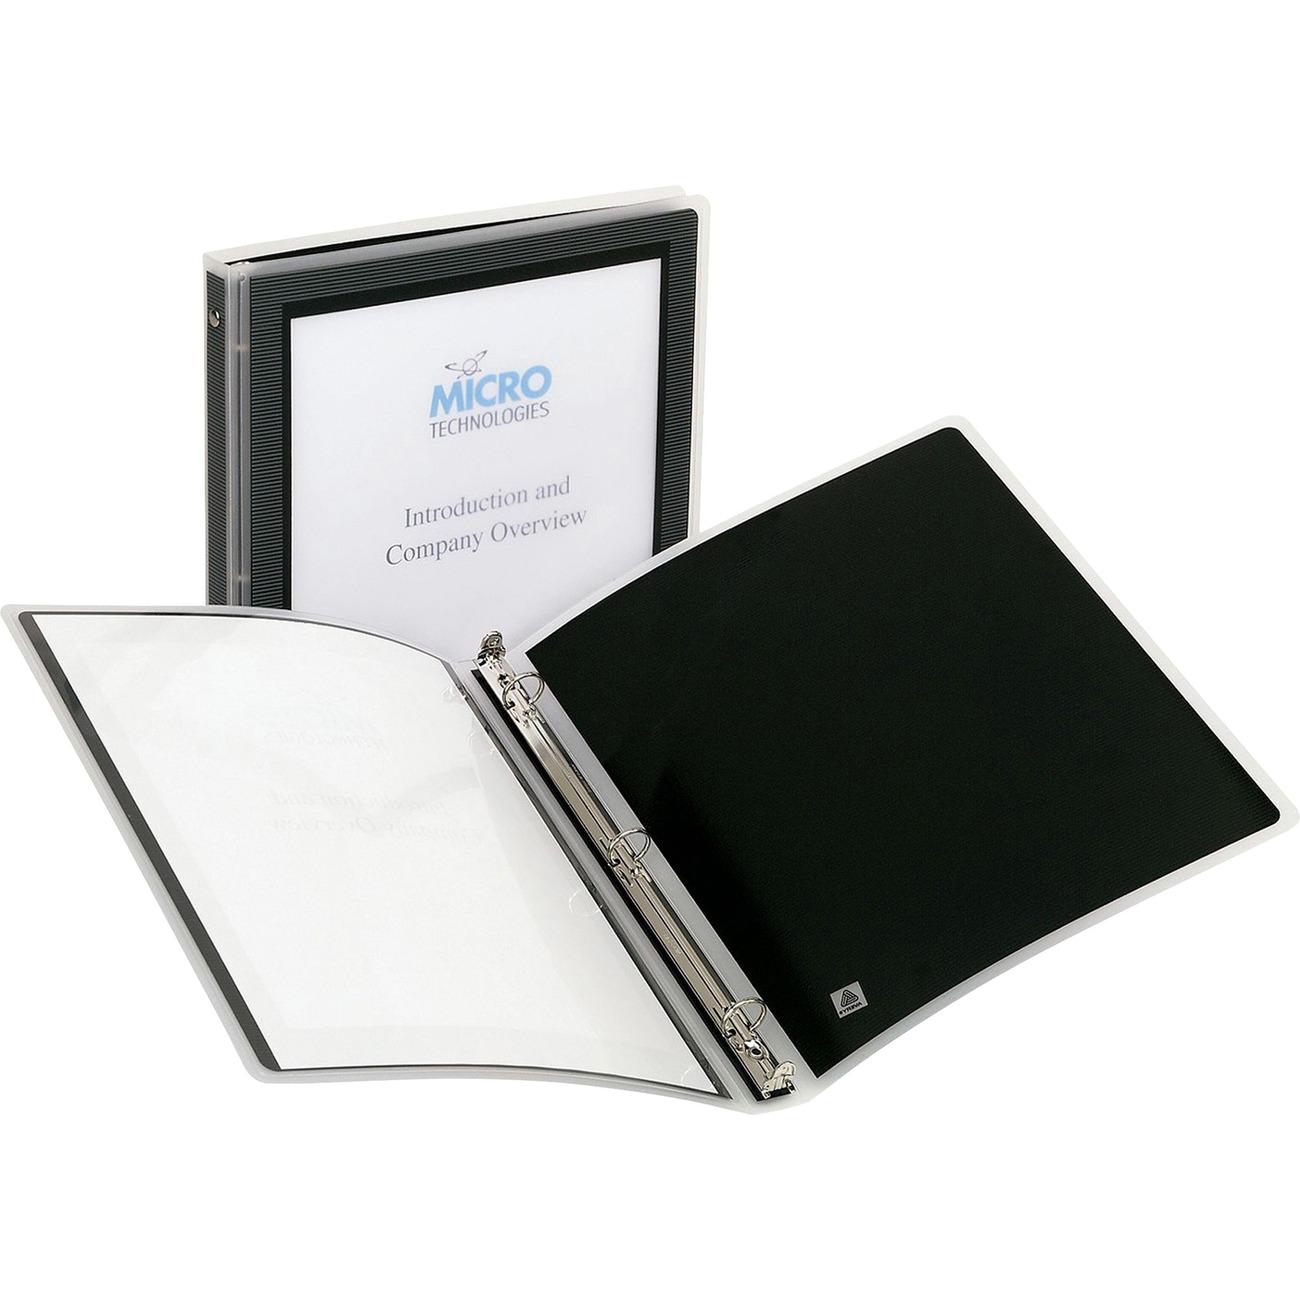 okanagan office systems    office supplies    binders